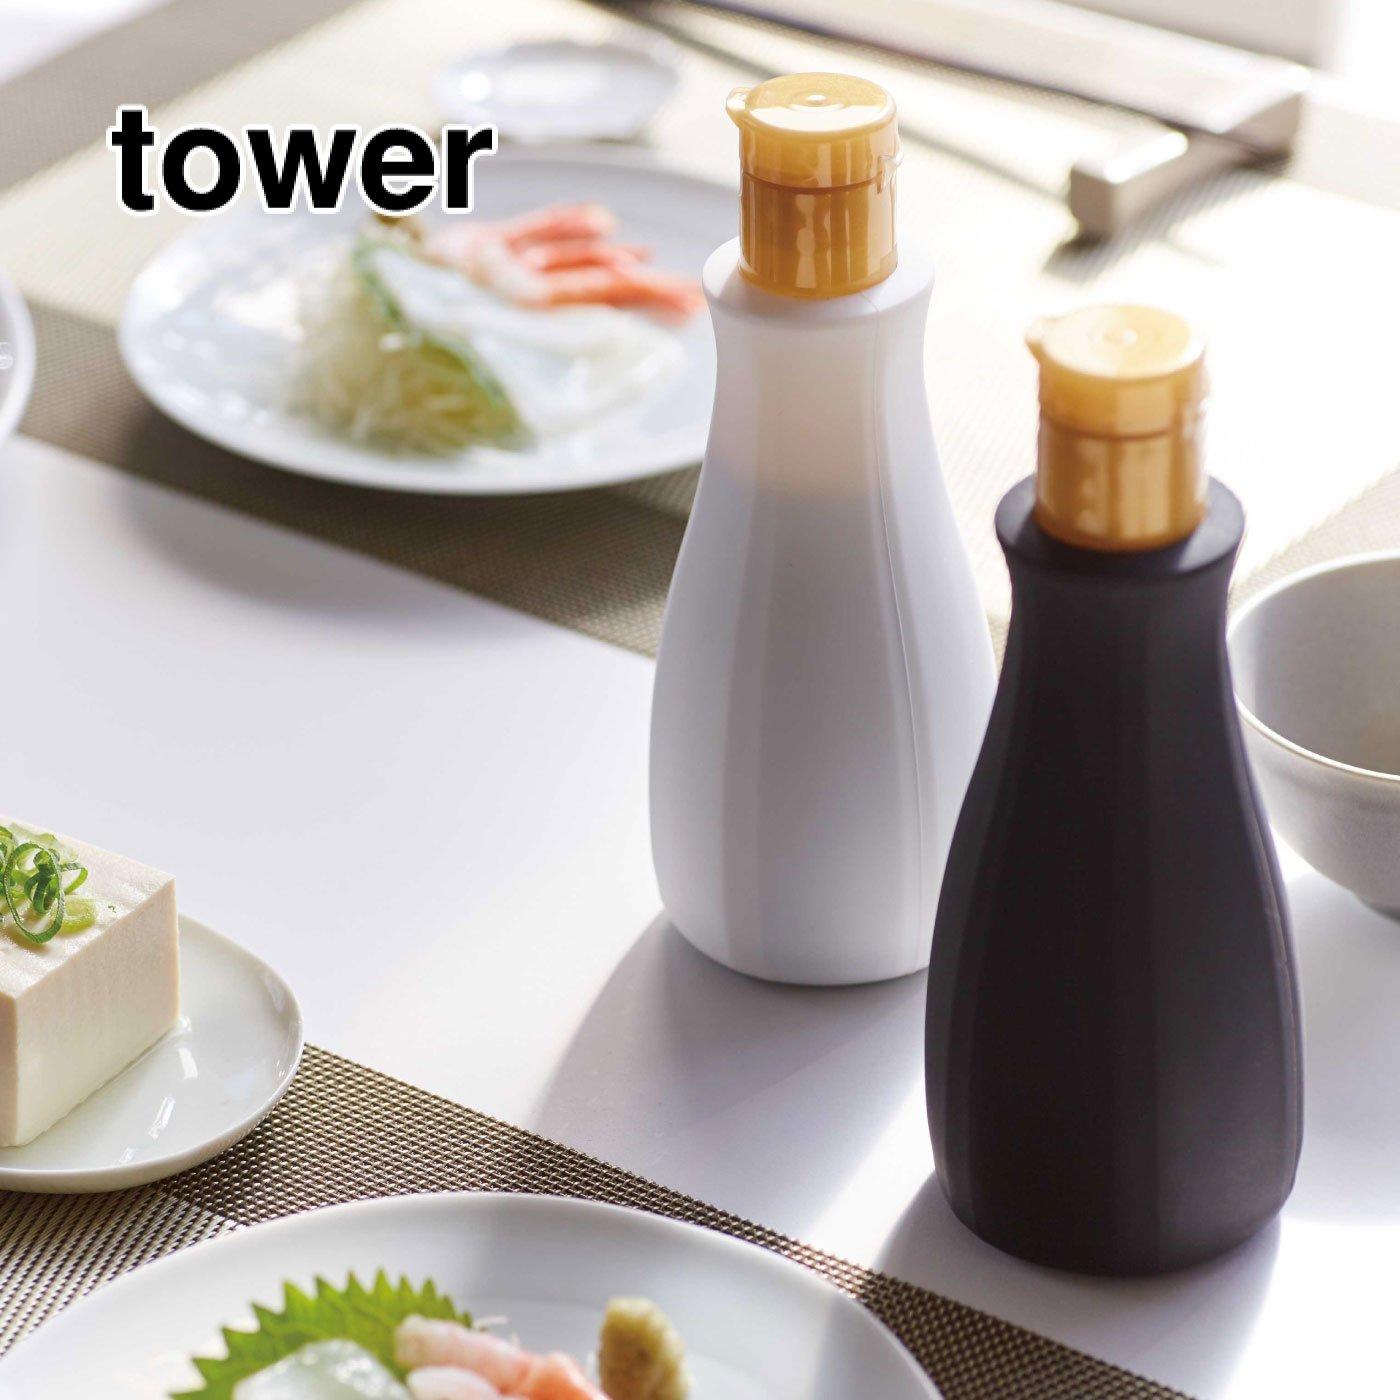 tower おしゃれに変身!卓上醤油ボトルカバー